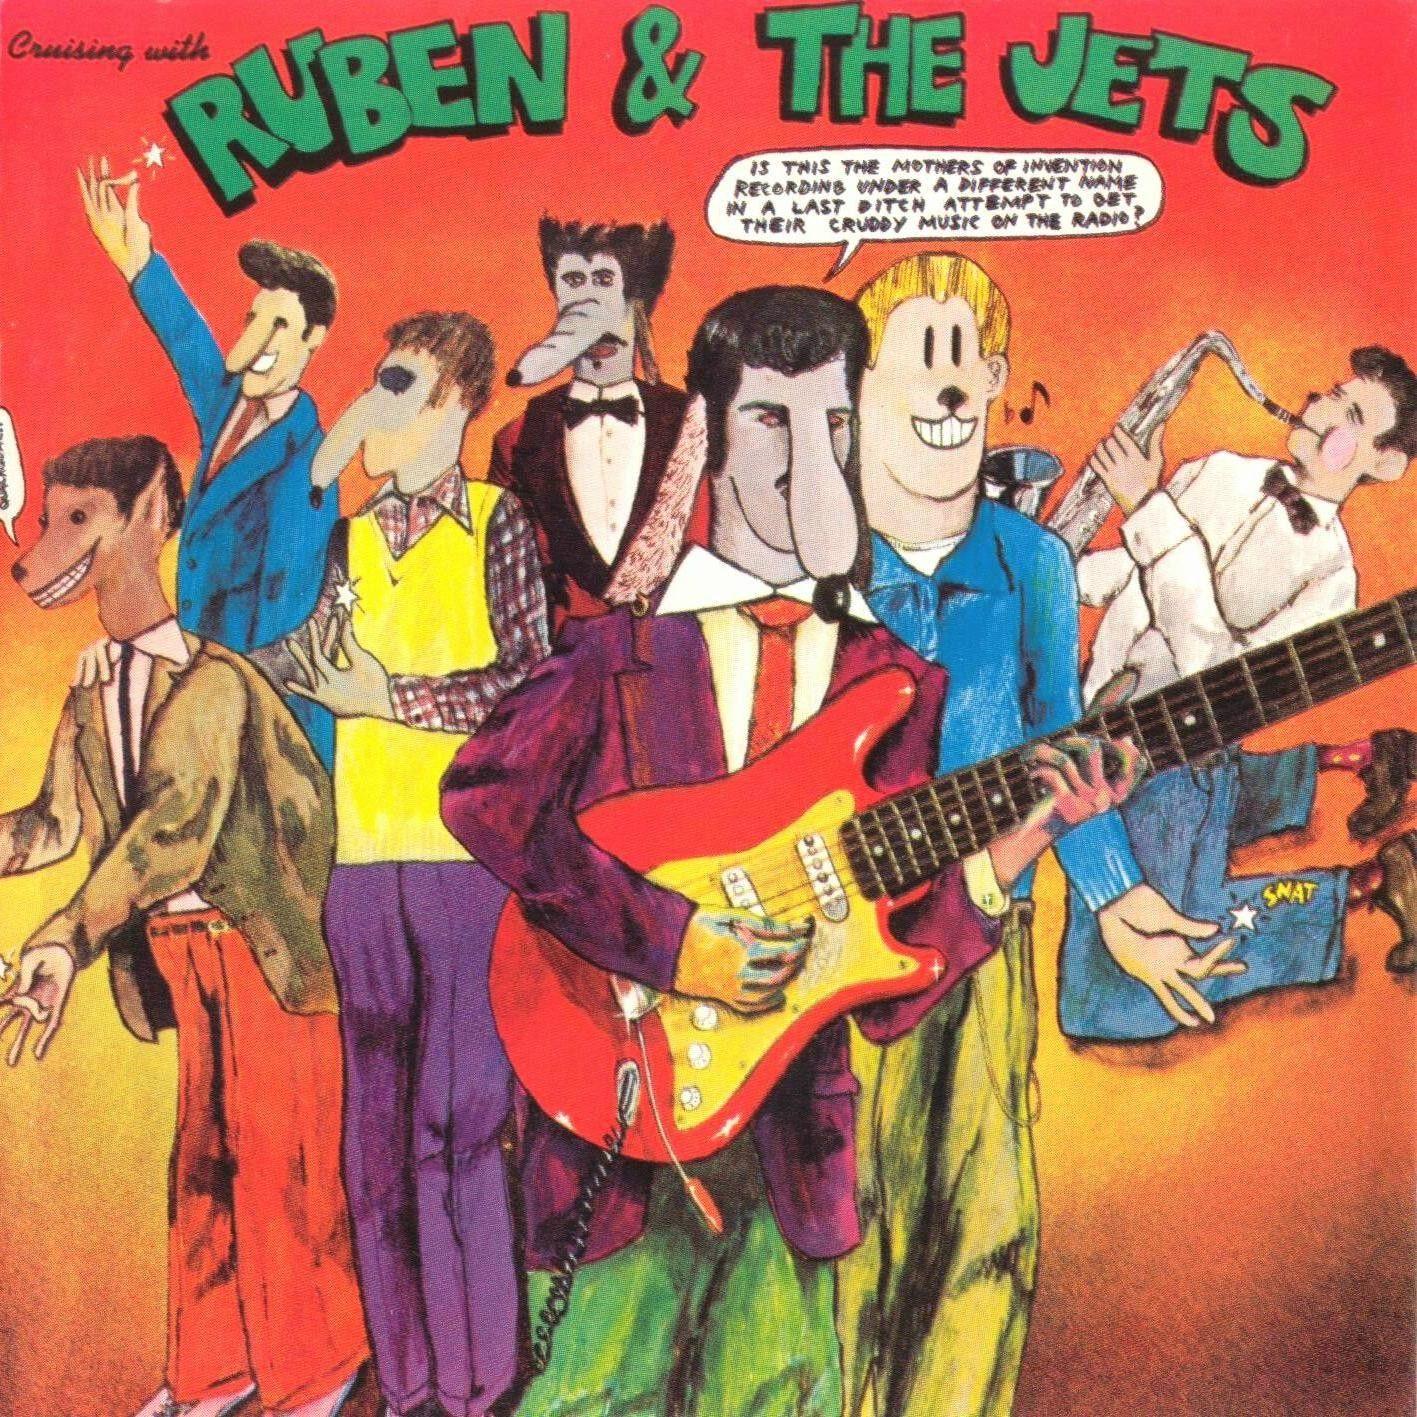 Frank Zappa Ruben And The Jets 1968 Albumhoezen